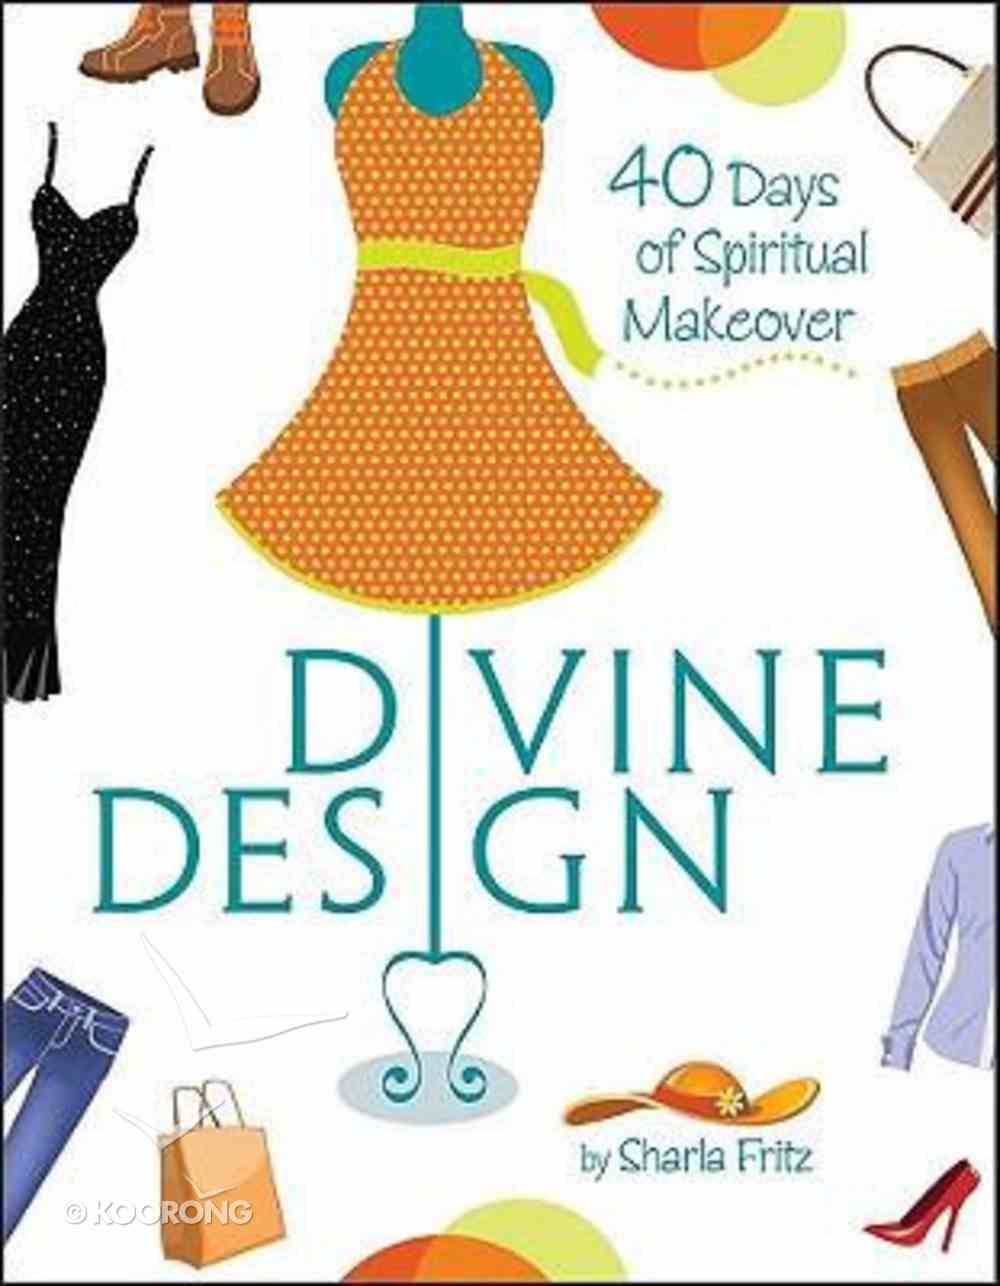 Divine Design Study Guide Paperback